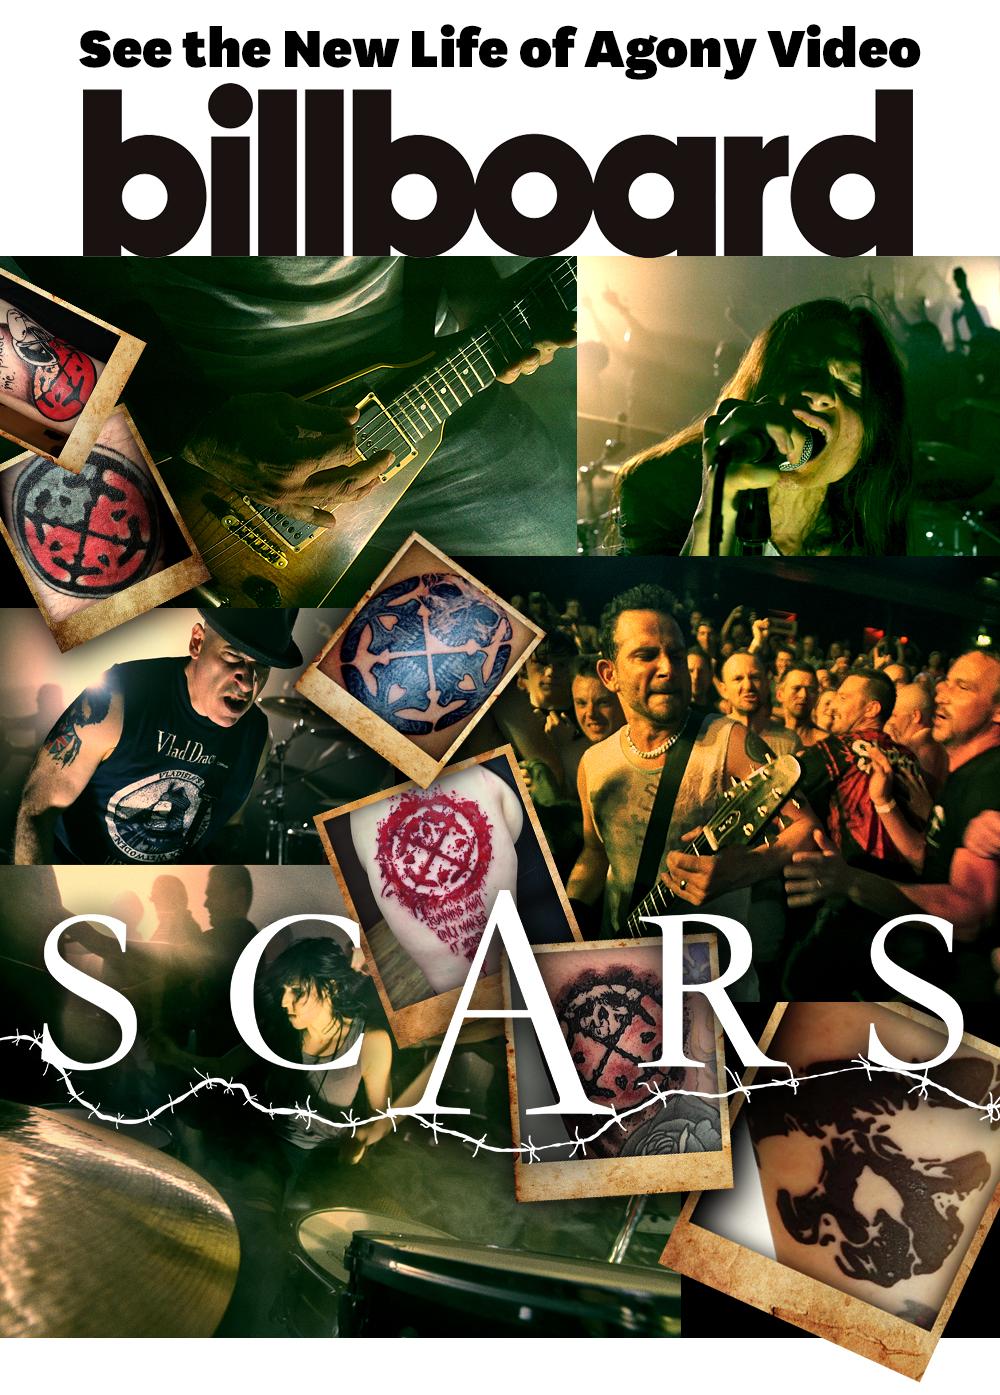 LOA-SCARS-VIDEO-Promo.jpg